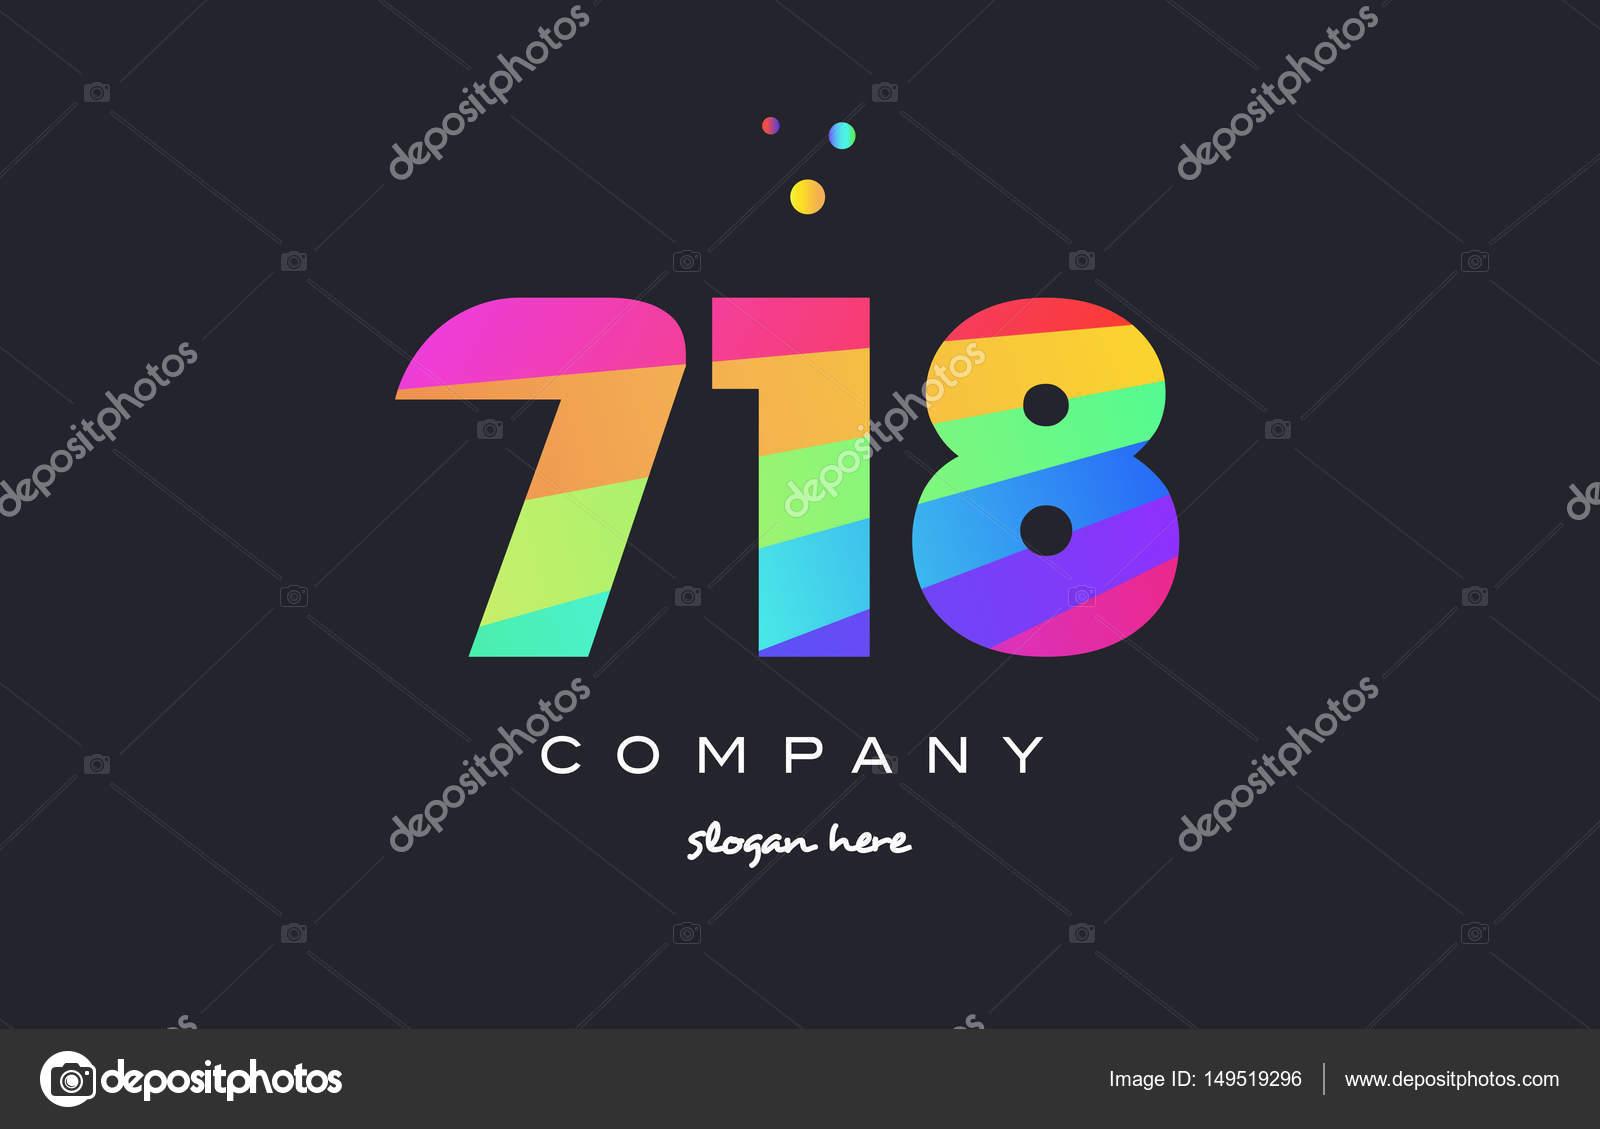 Números en imagen - Página 39 Depositphotos_149519296-stock-illustration-718-colored-rainbow-creative-number